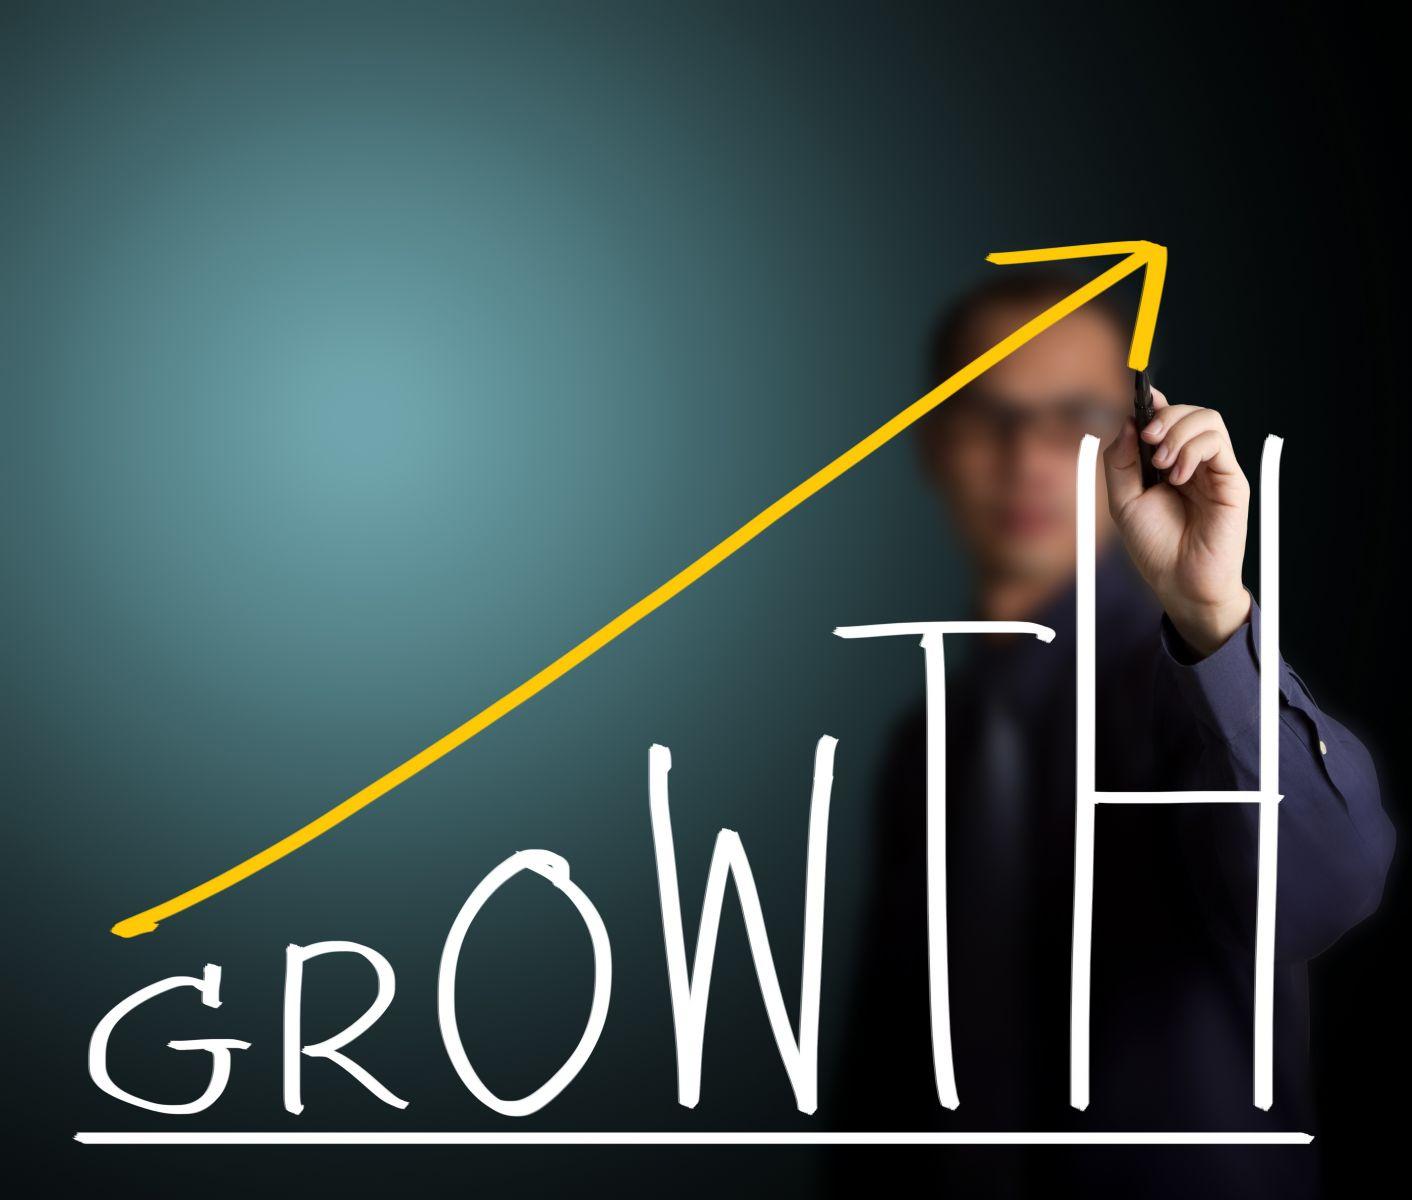 5 Metrics B2B Companies need to scale from 100 to 1000 customers